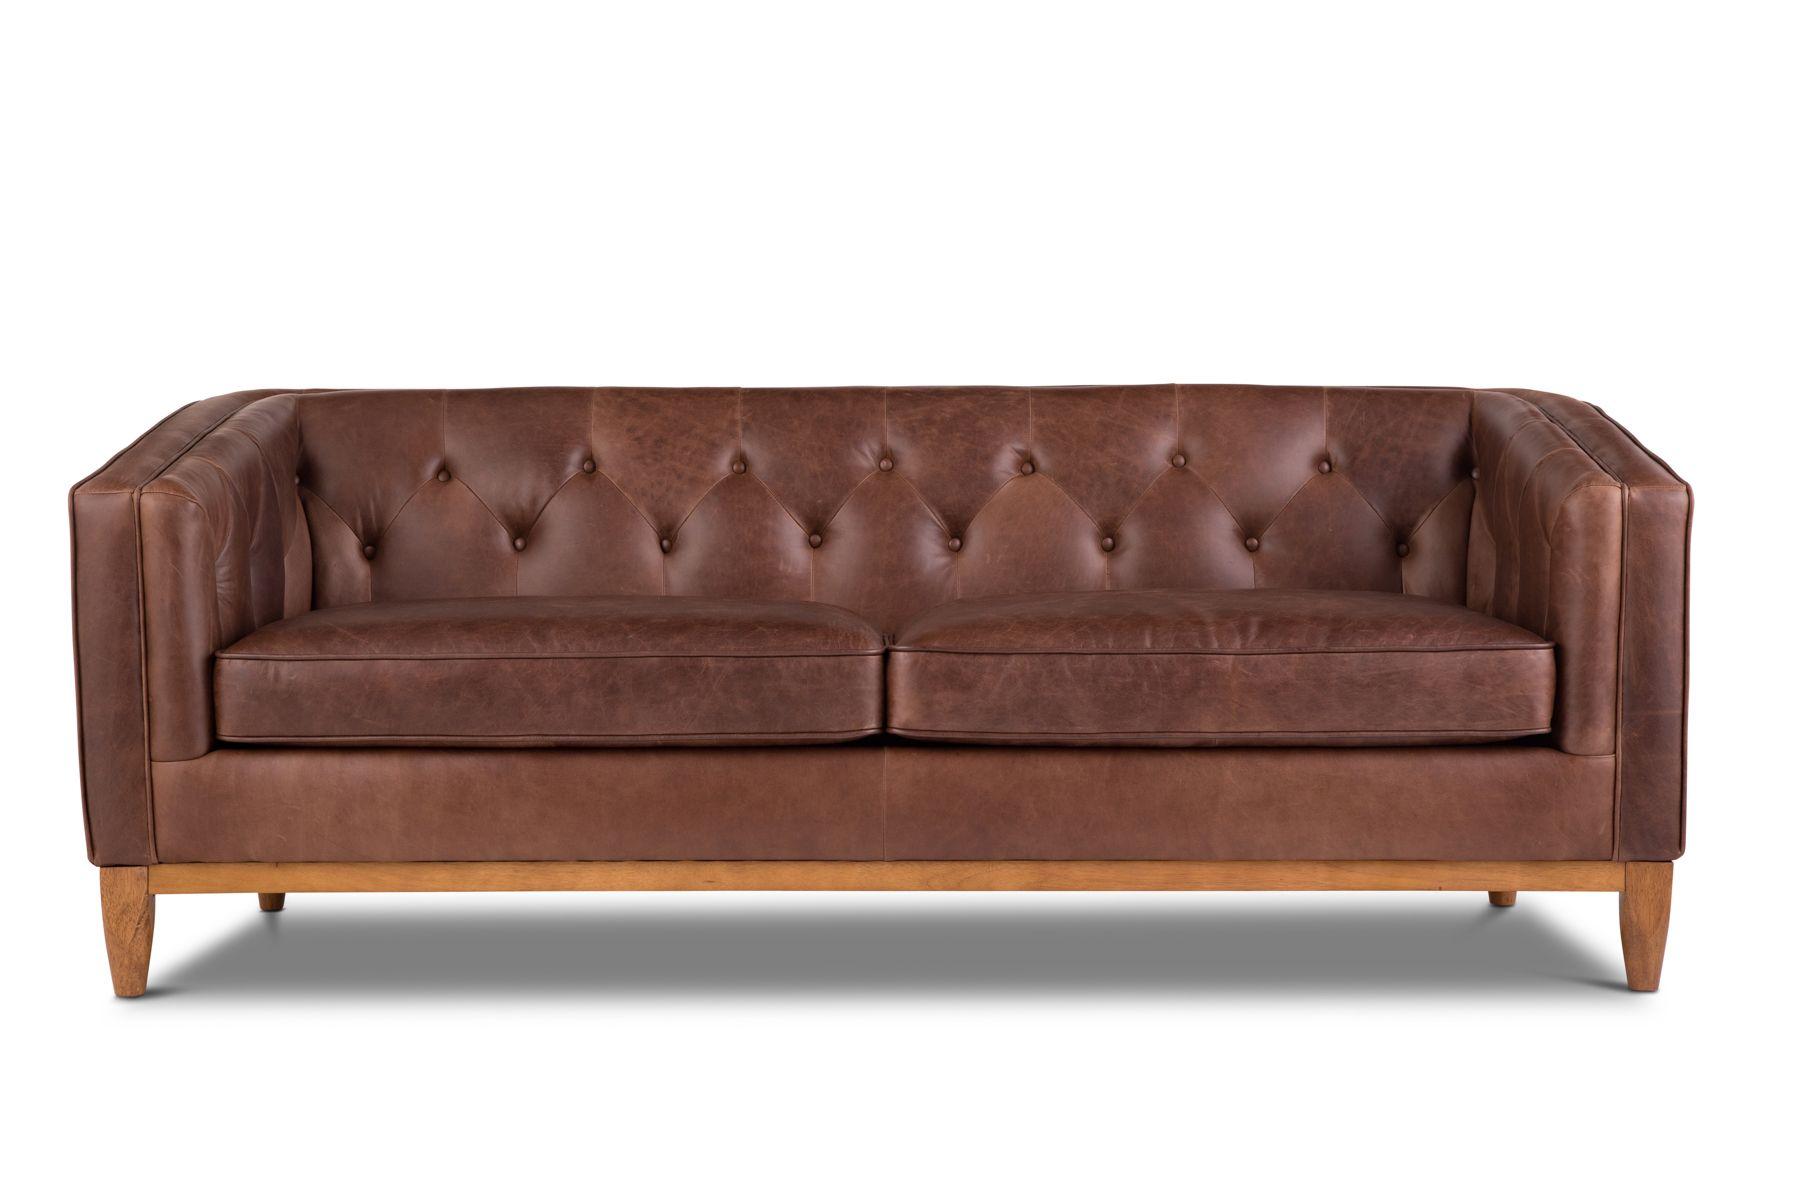 Top Ergebnis 50 Best Chesterfield sofa Modern Foto 2018 Phe2 2017